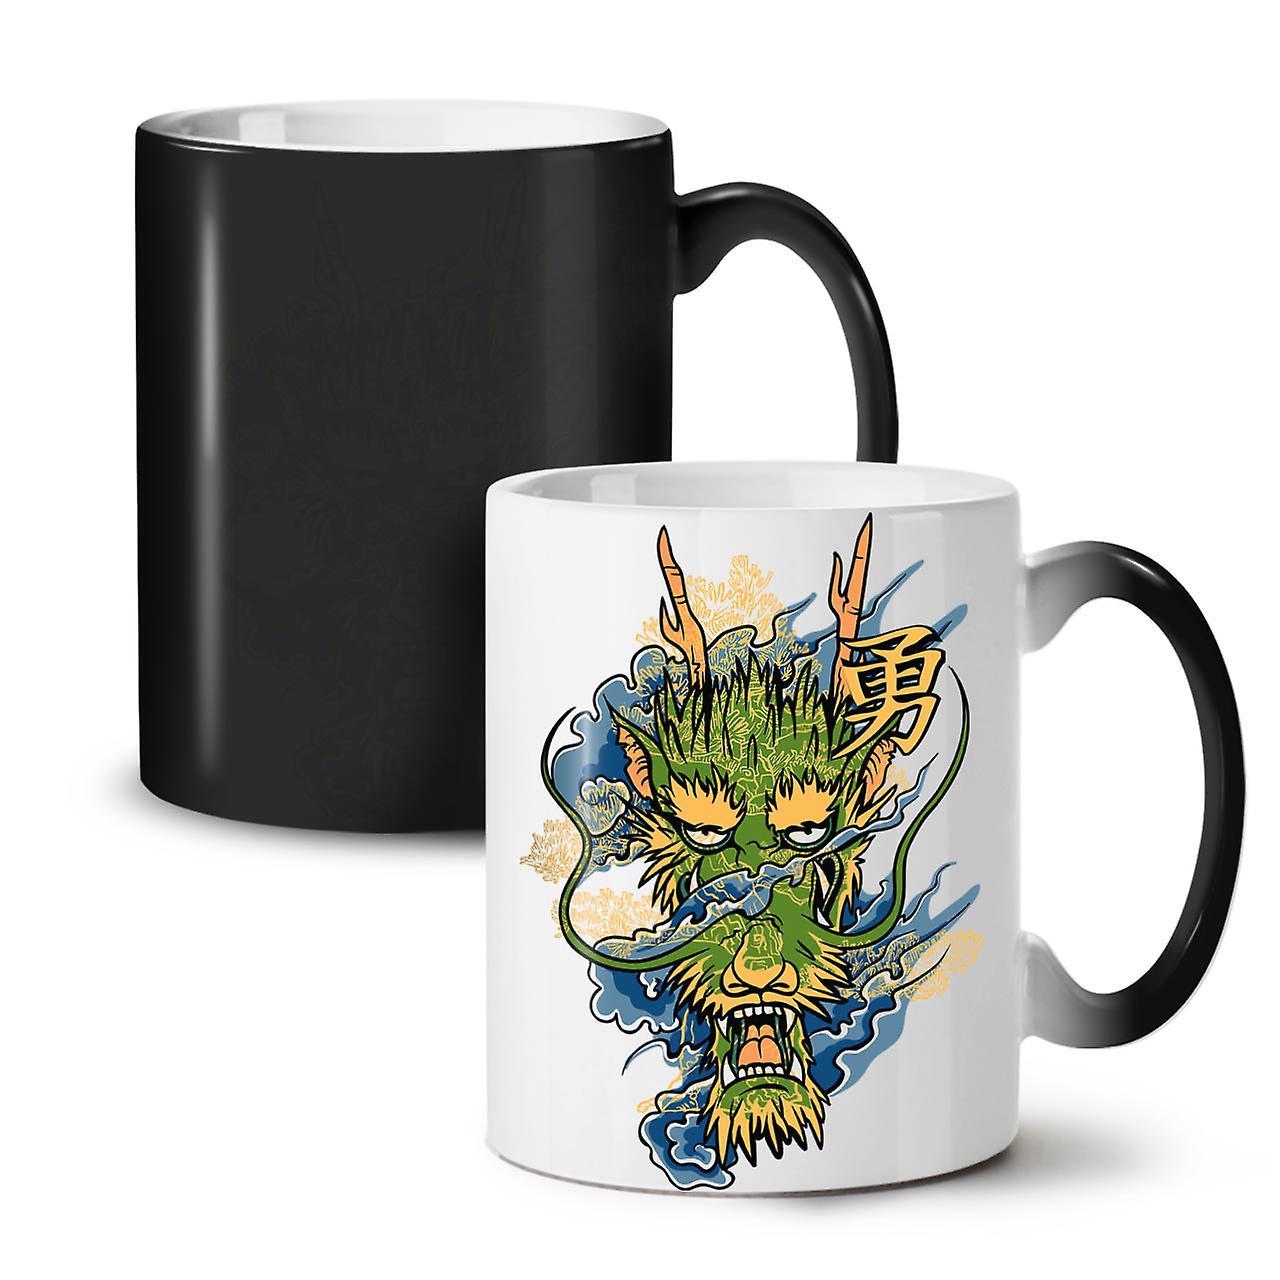 Sun Coffee Black Mug 11 New Japanese Katana Ceramic OzWellcoda Changing Colour Tea hQxBdtrCs